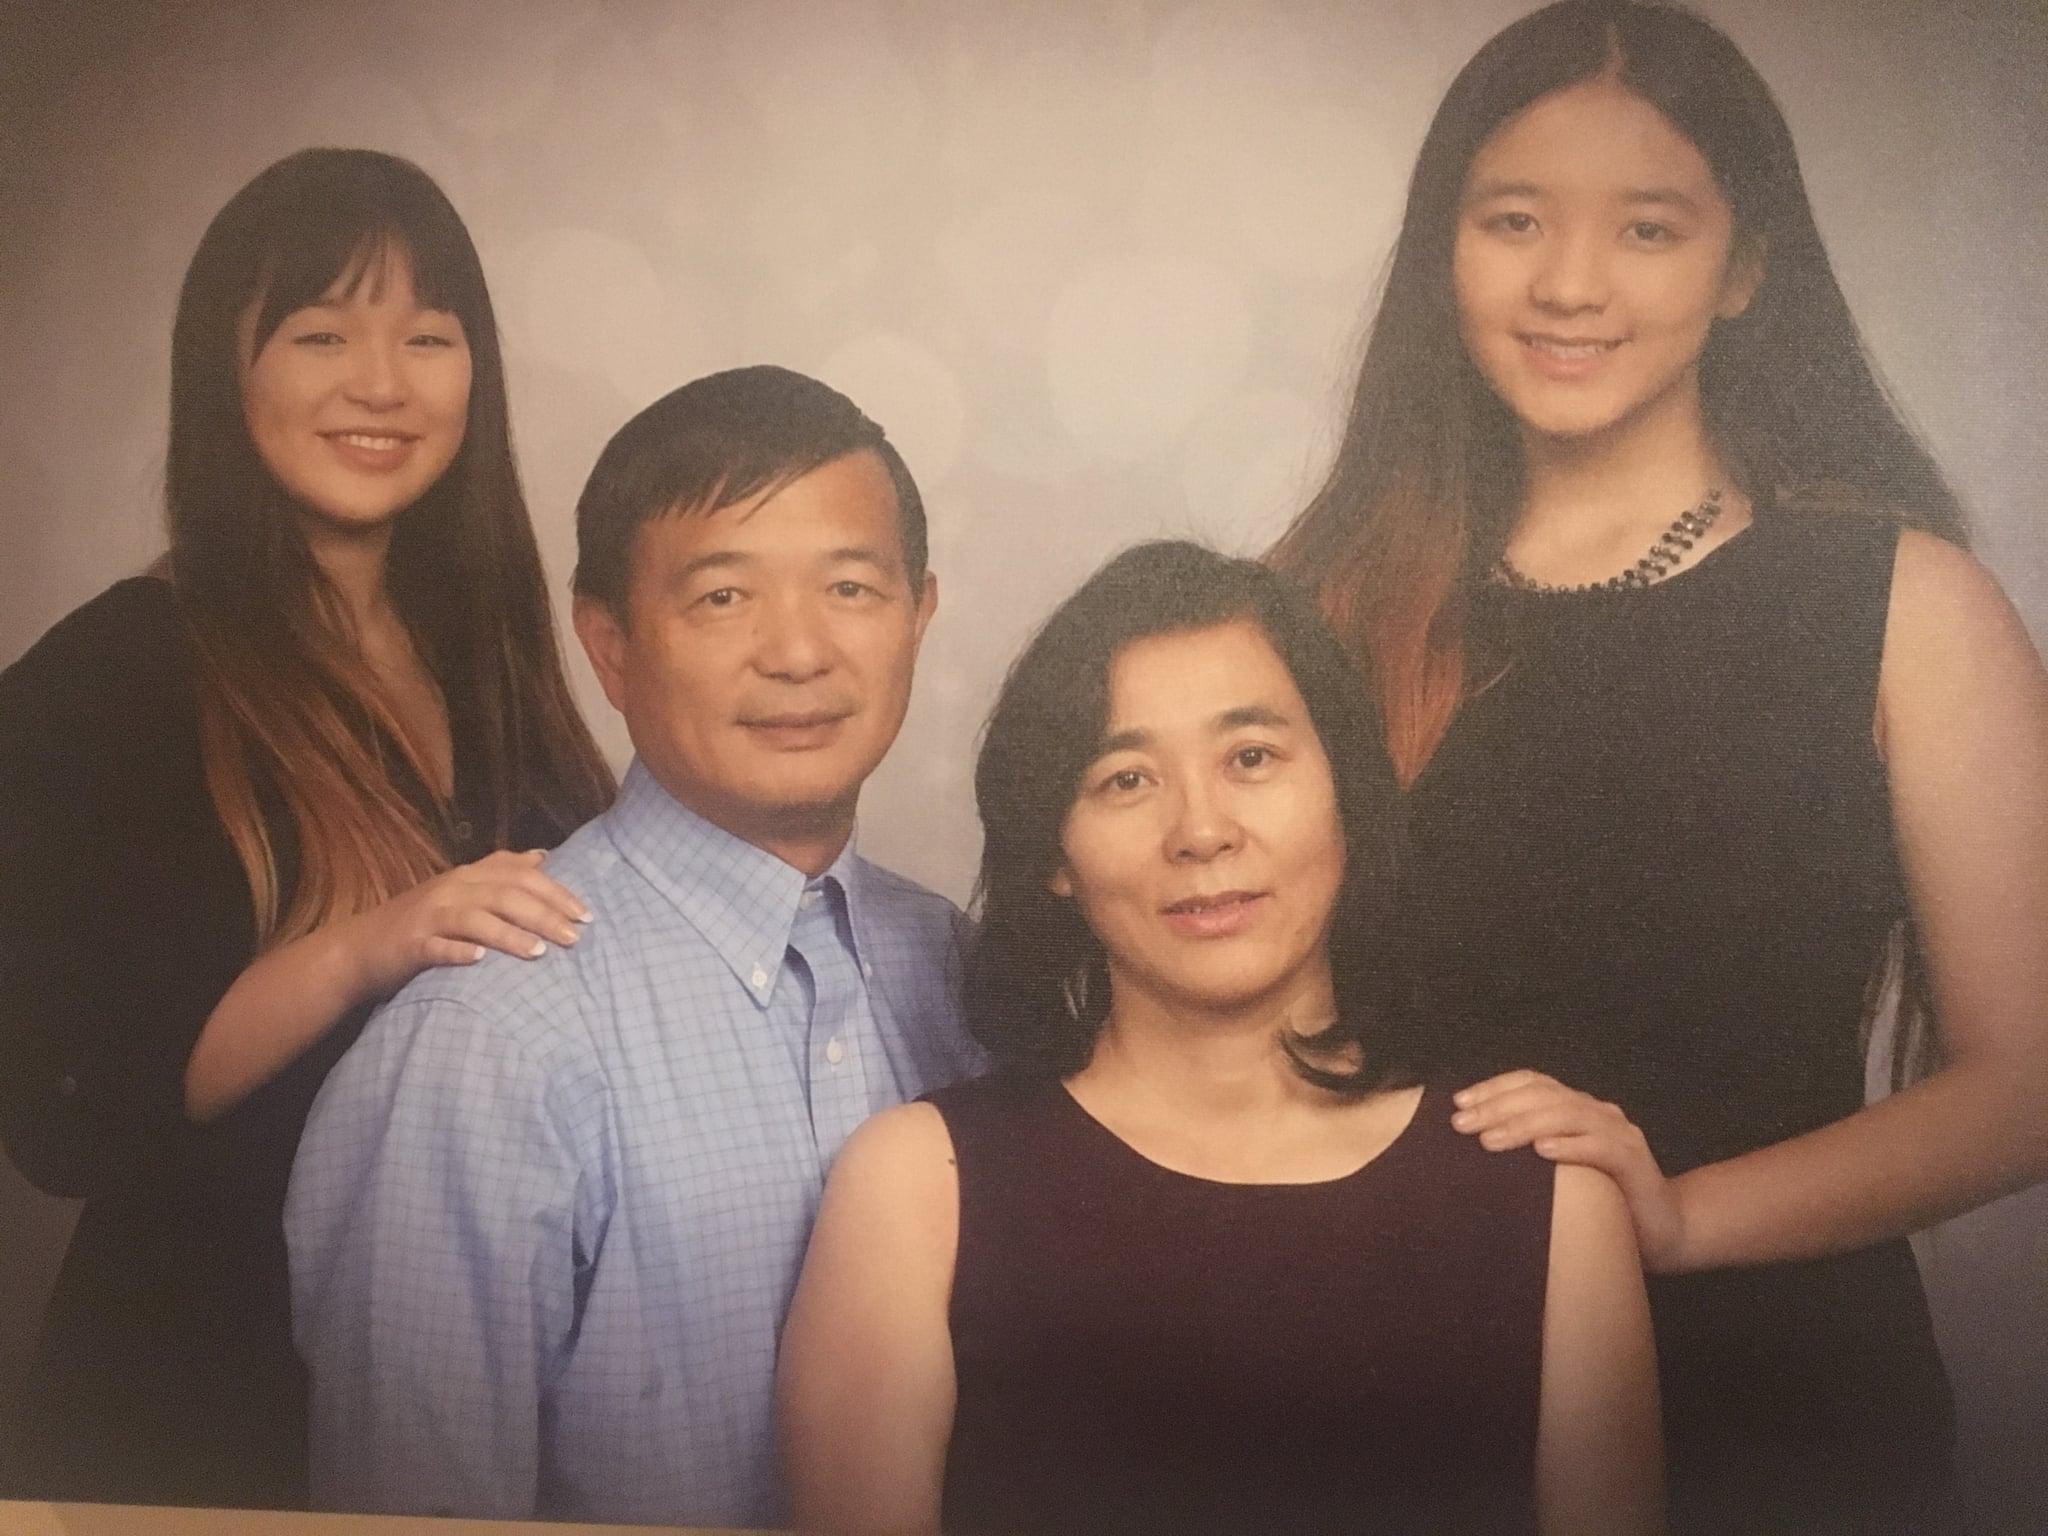 tmp_nsmWYC_8af1d3c02f84beac_family.jpeg